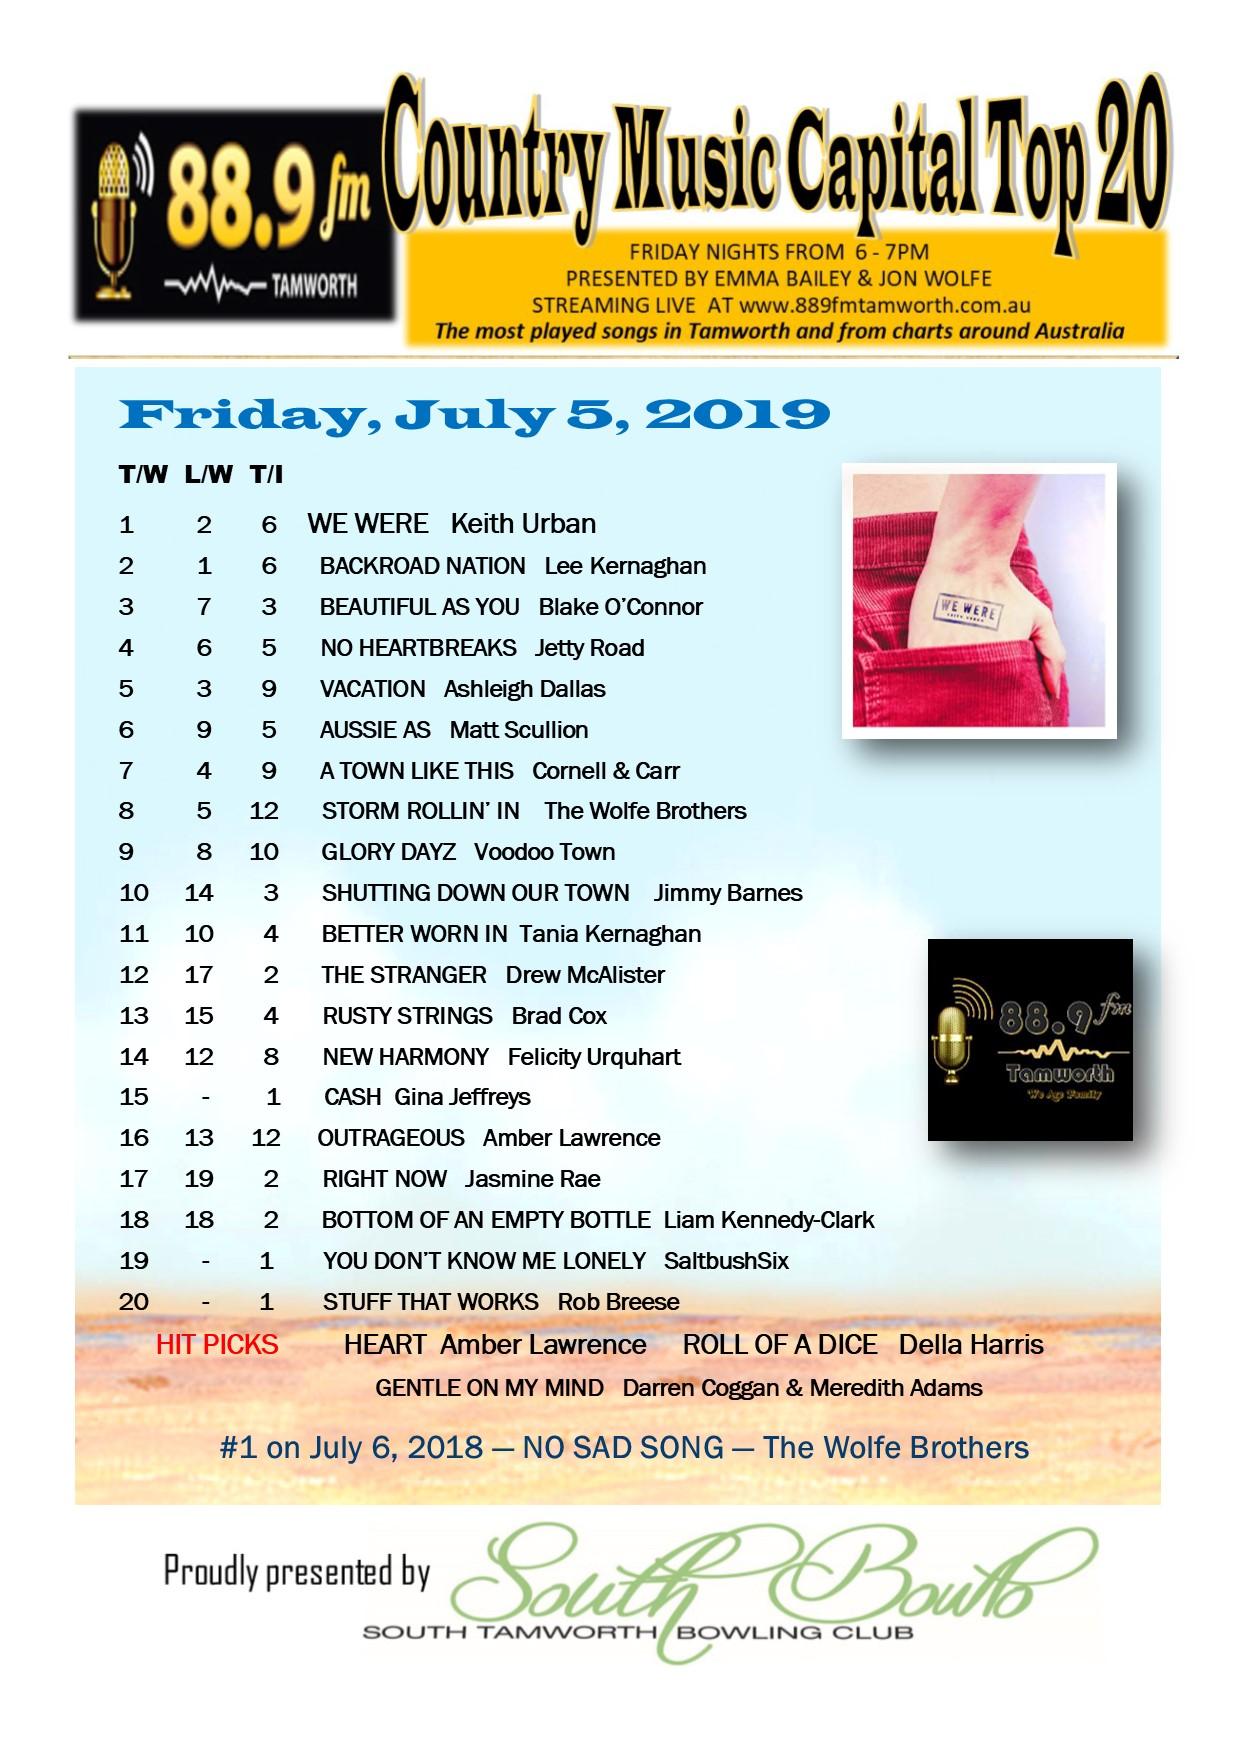 Top 20 Chart 5 July 2019.jpg